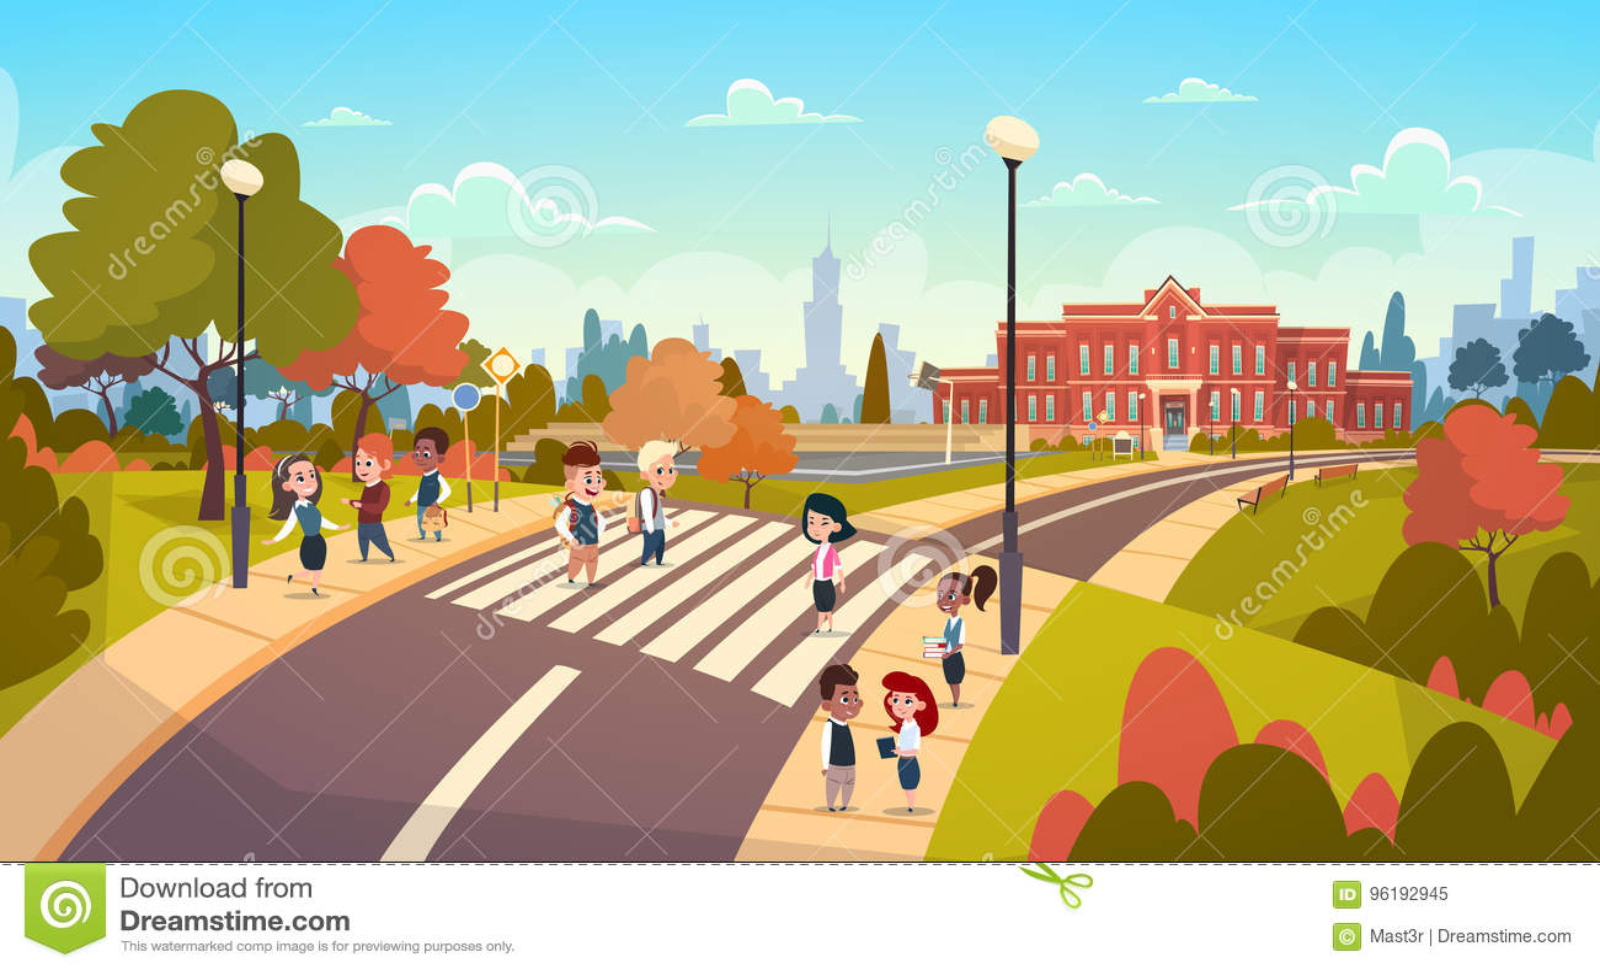 Group Of Pupils Walking On Crosswalk Mix Race Students Go To School Crossing Street